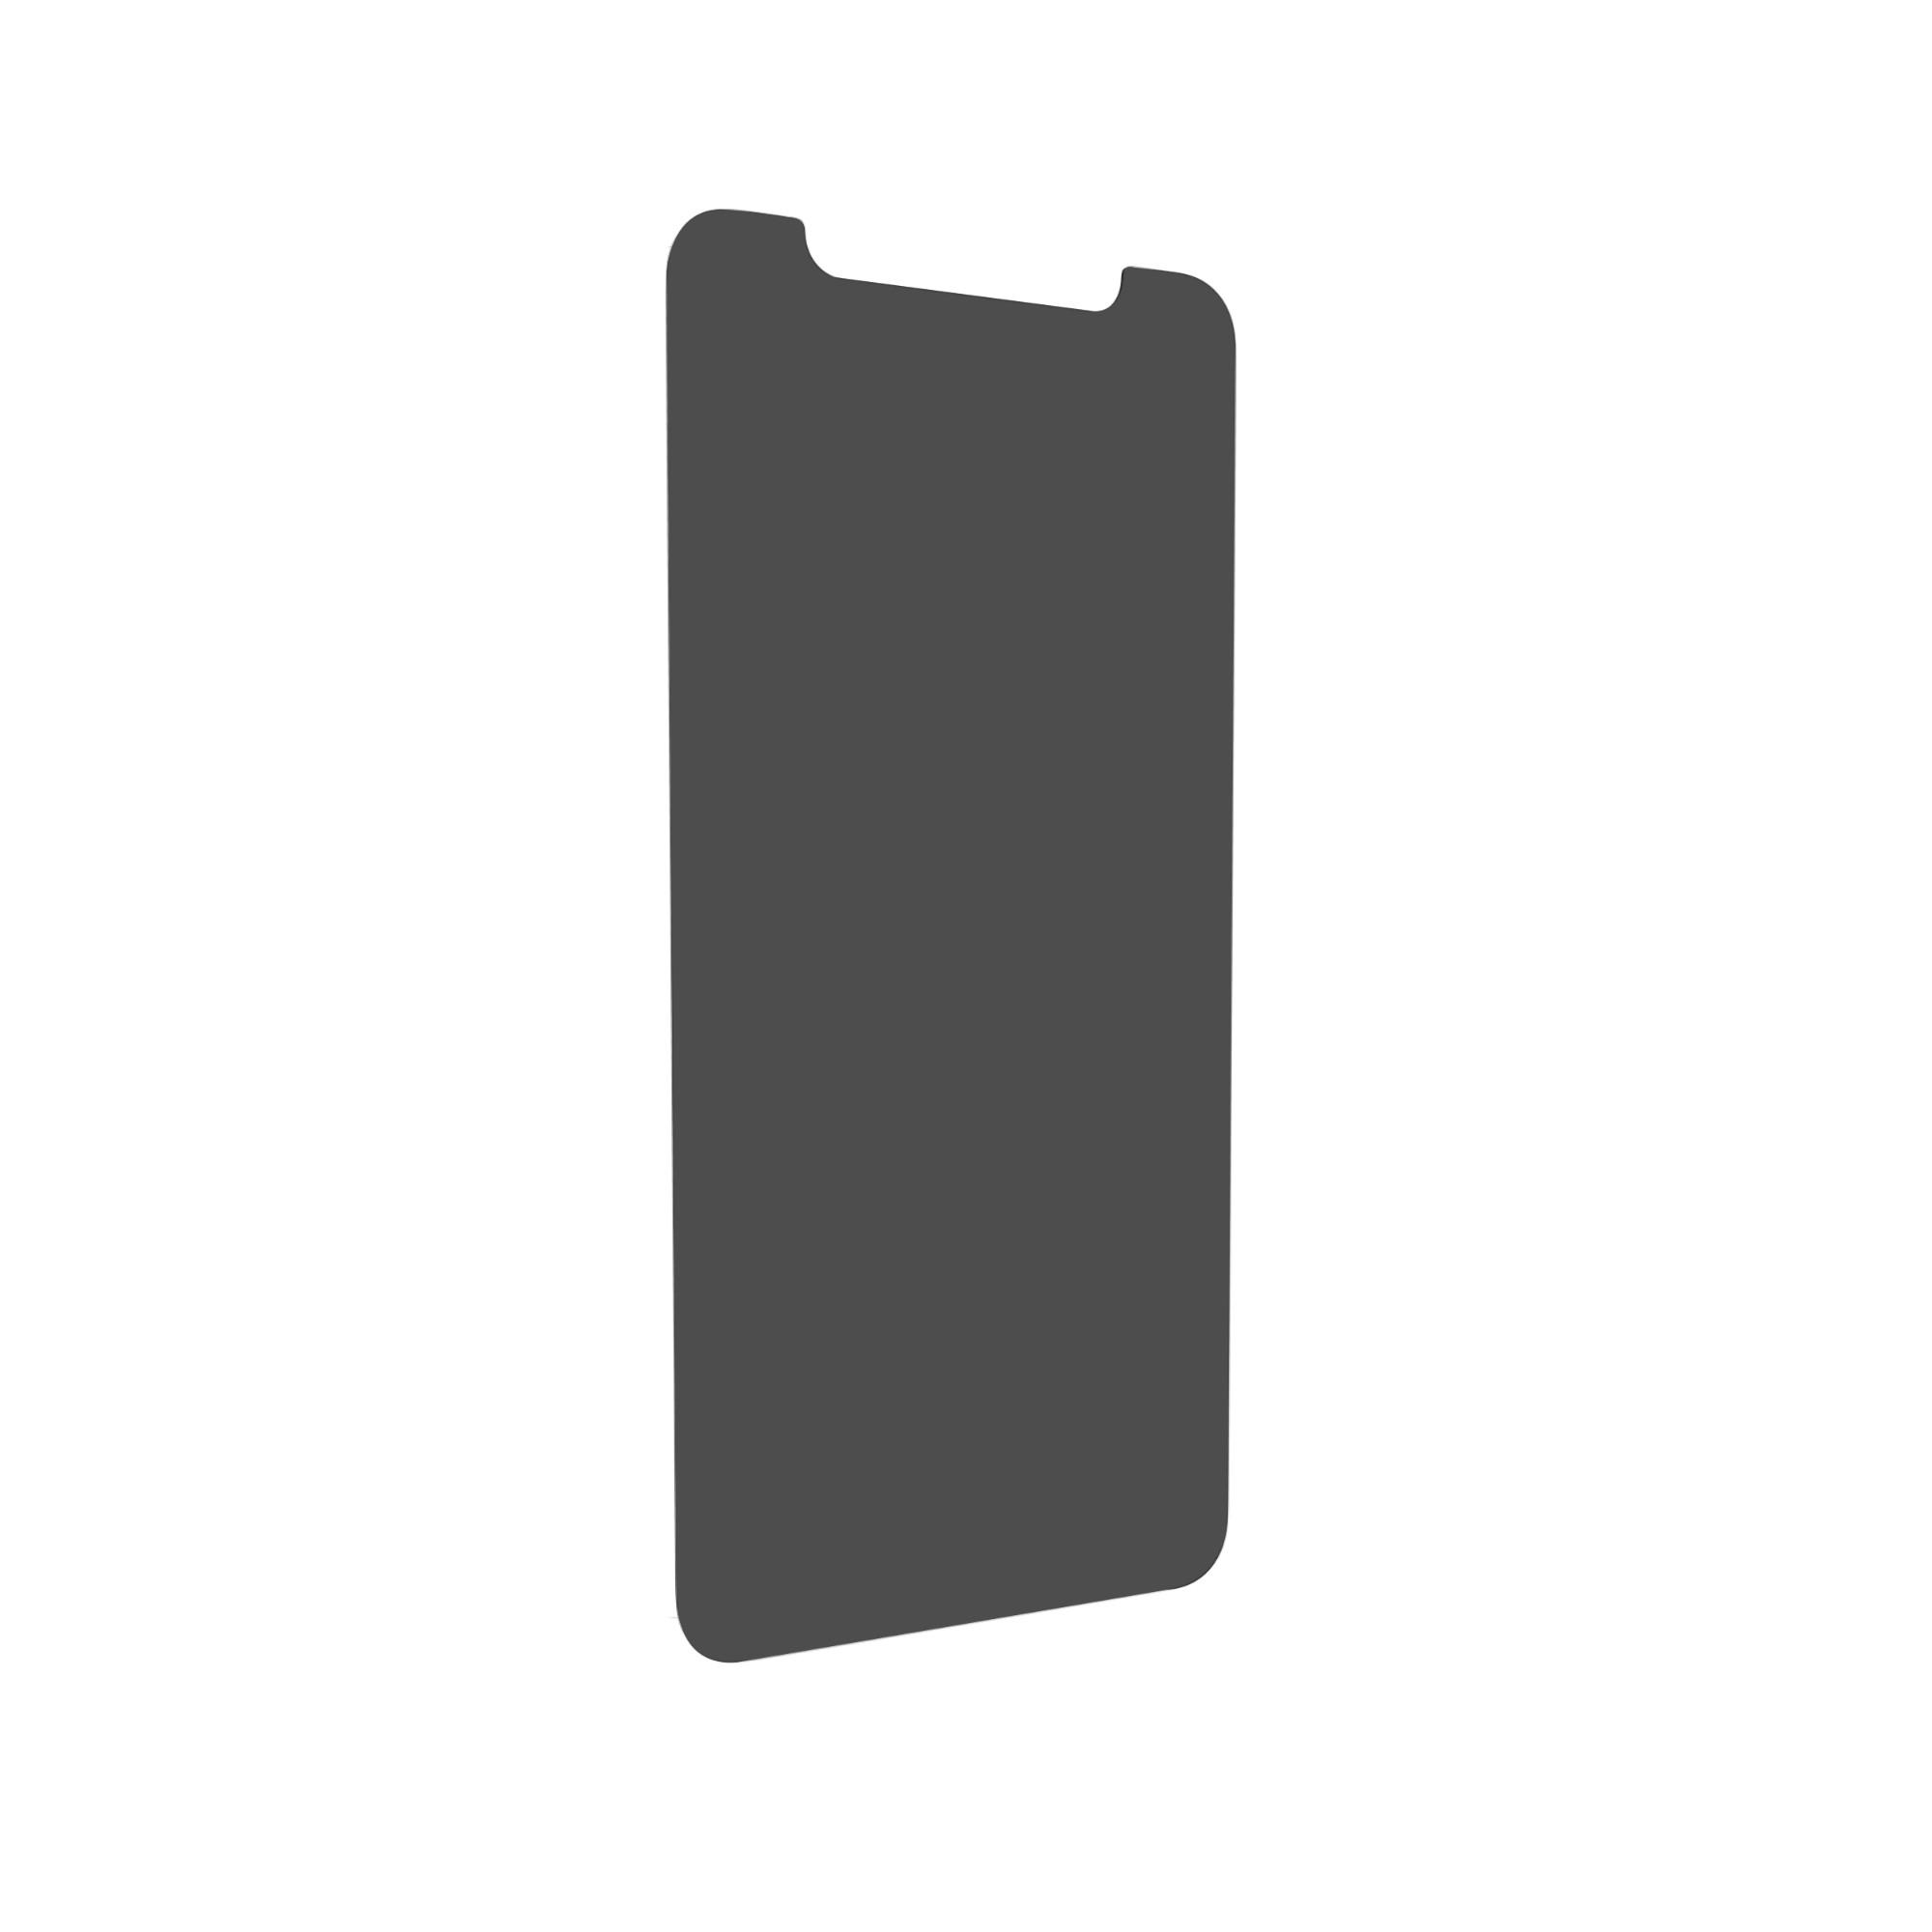 InvisibleShield Glass Elite Privacy iPhone 11 Pro Max Screen